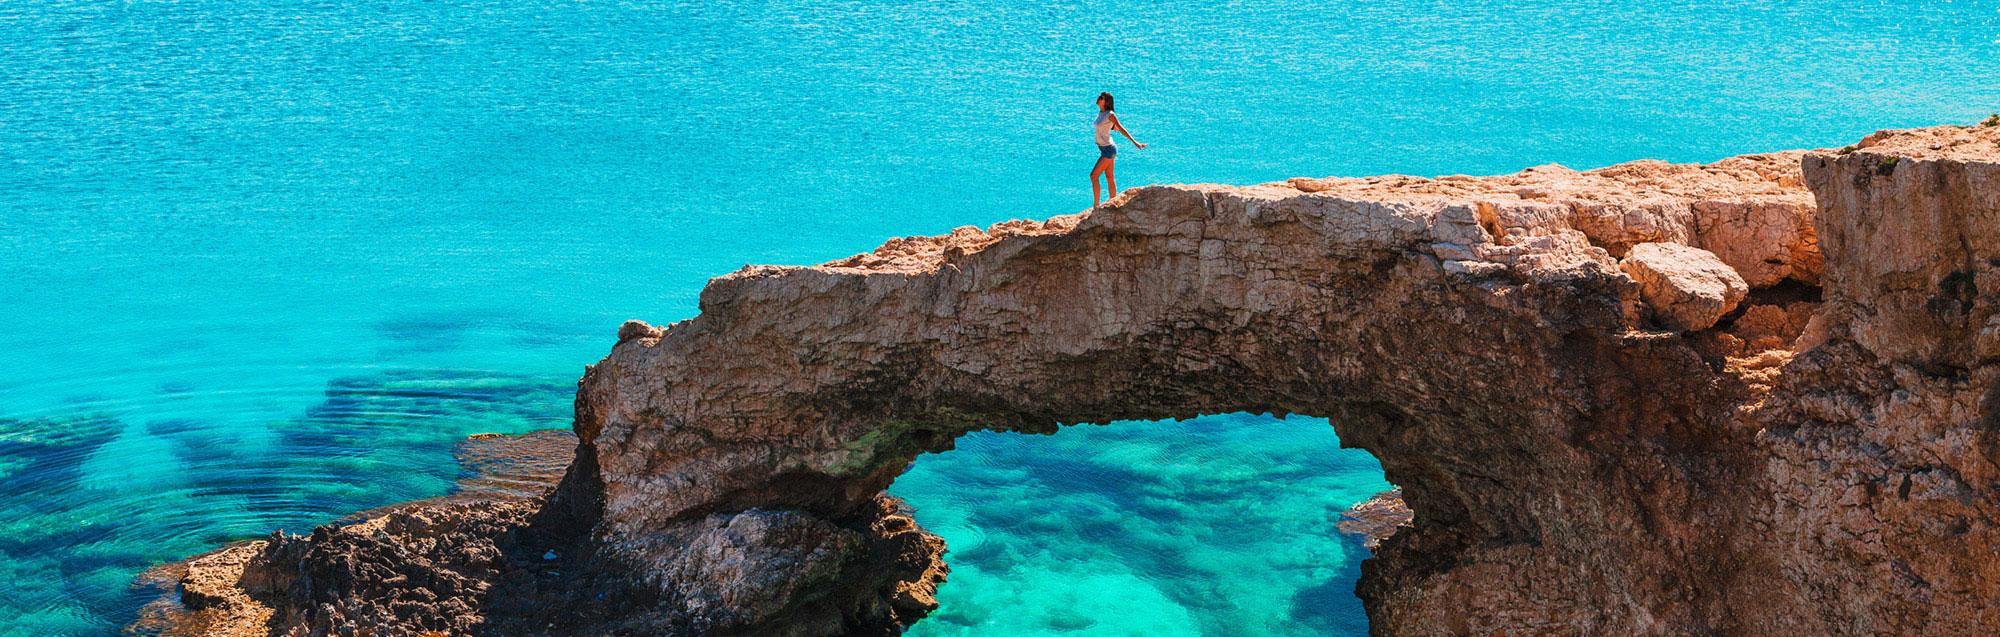 Sprachreise Zypern